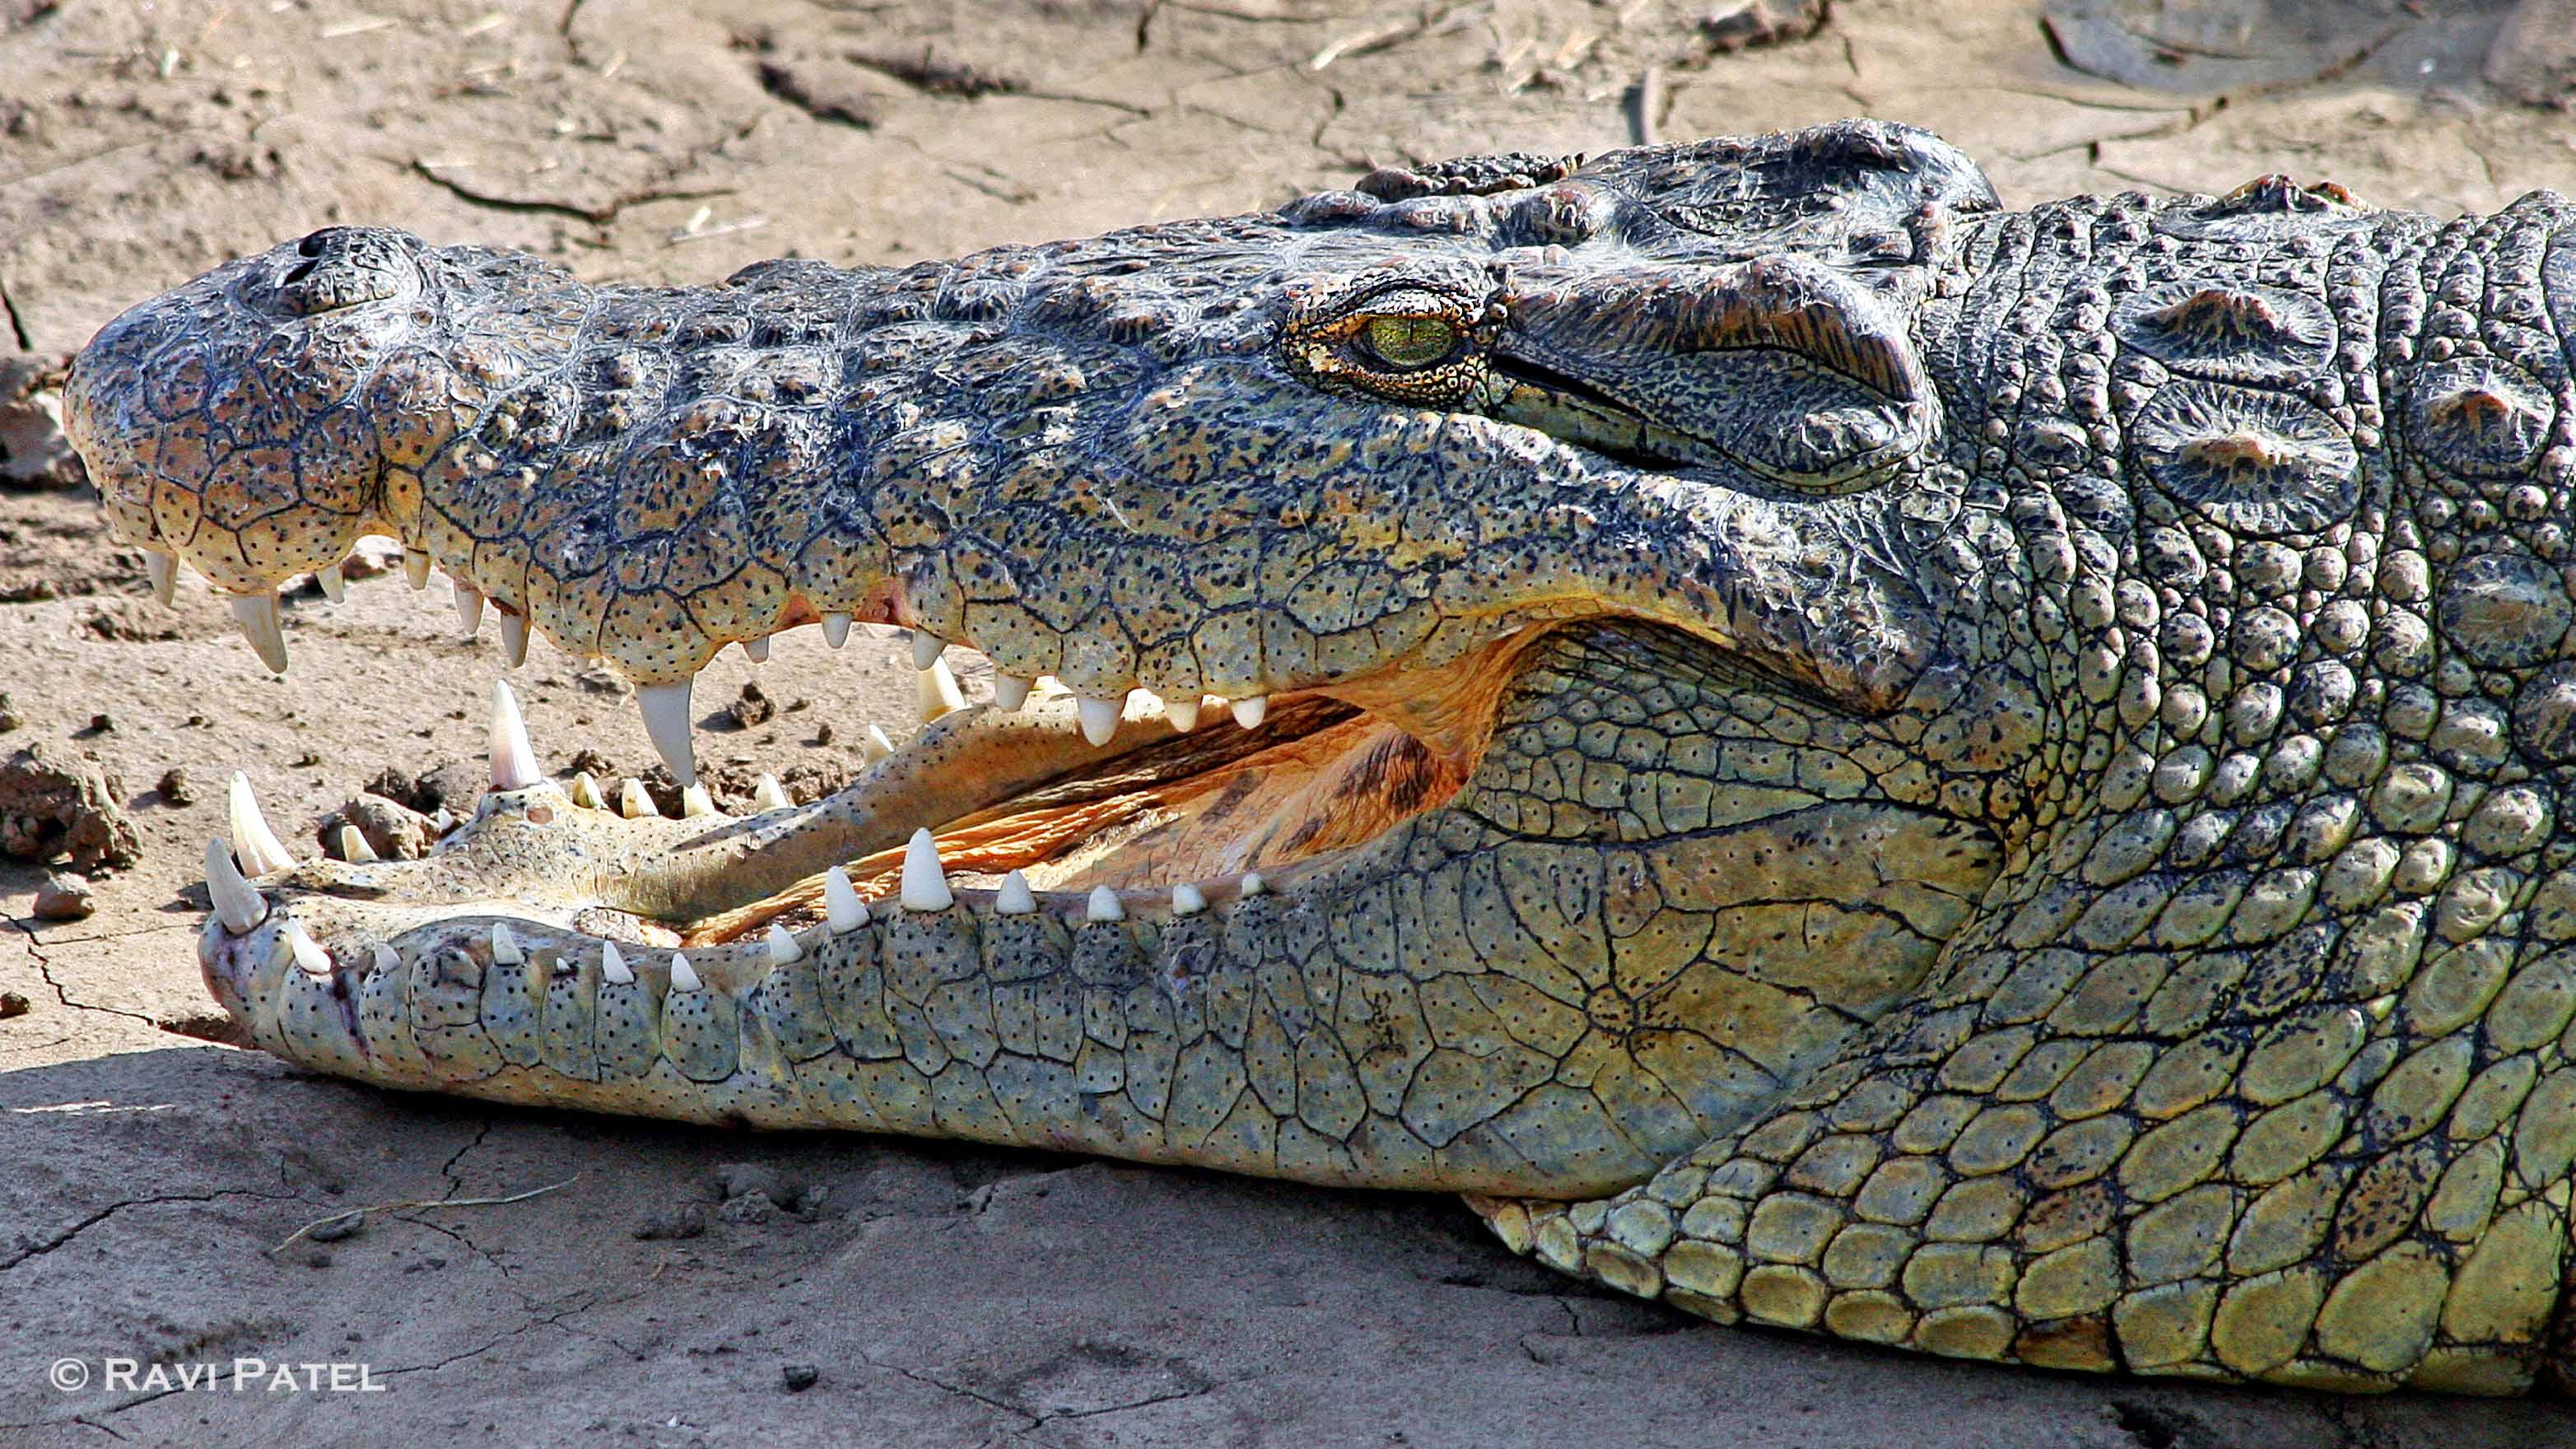 Nile Crocodile Up Close | Photos by Ravi